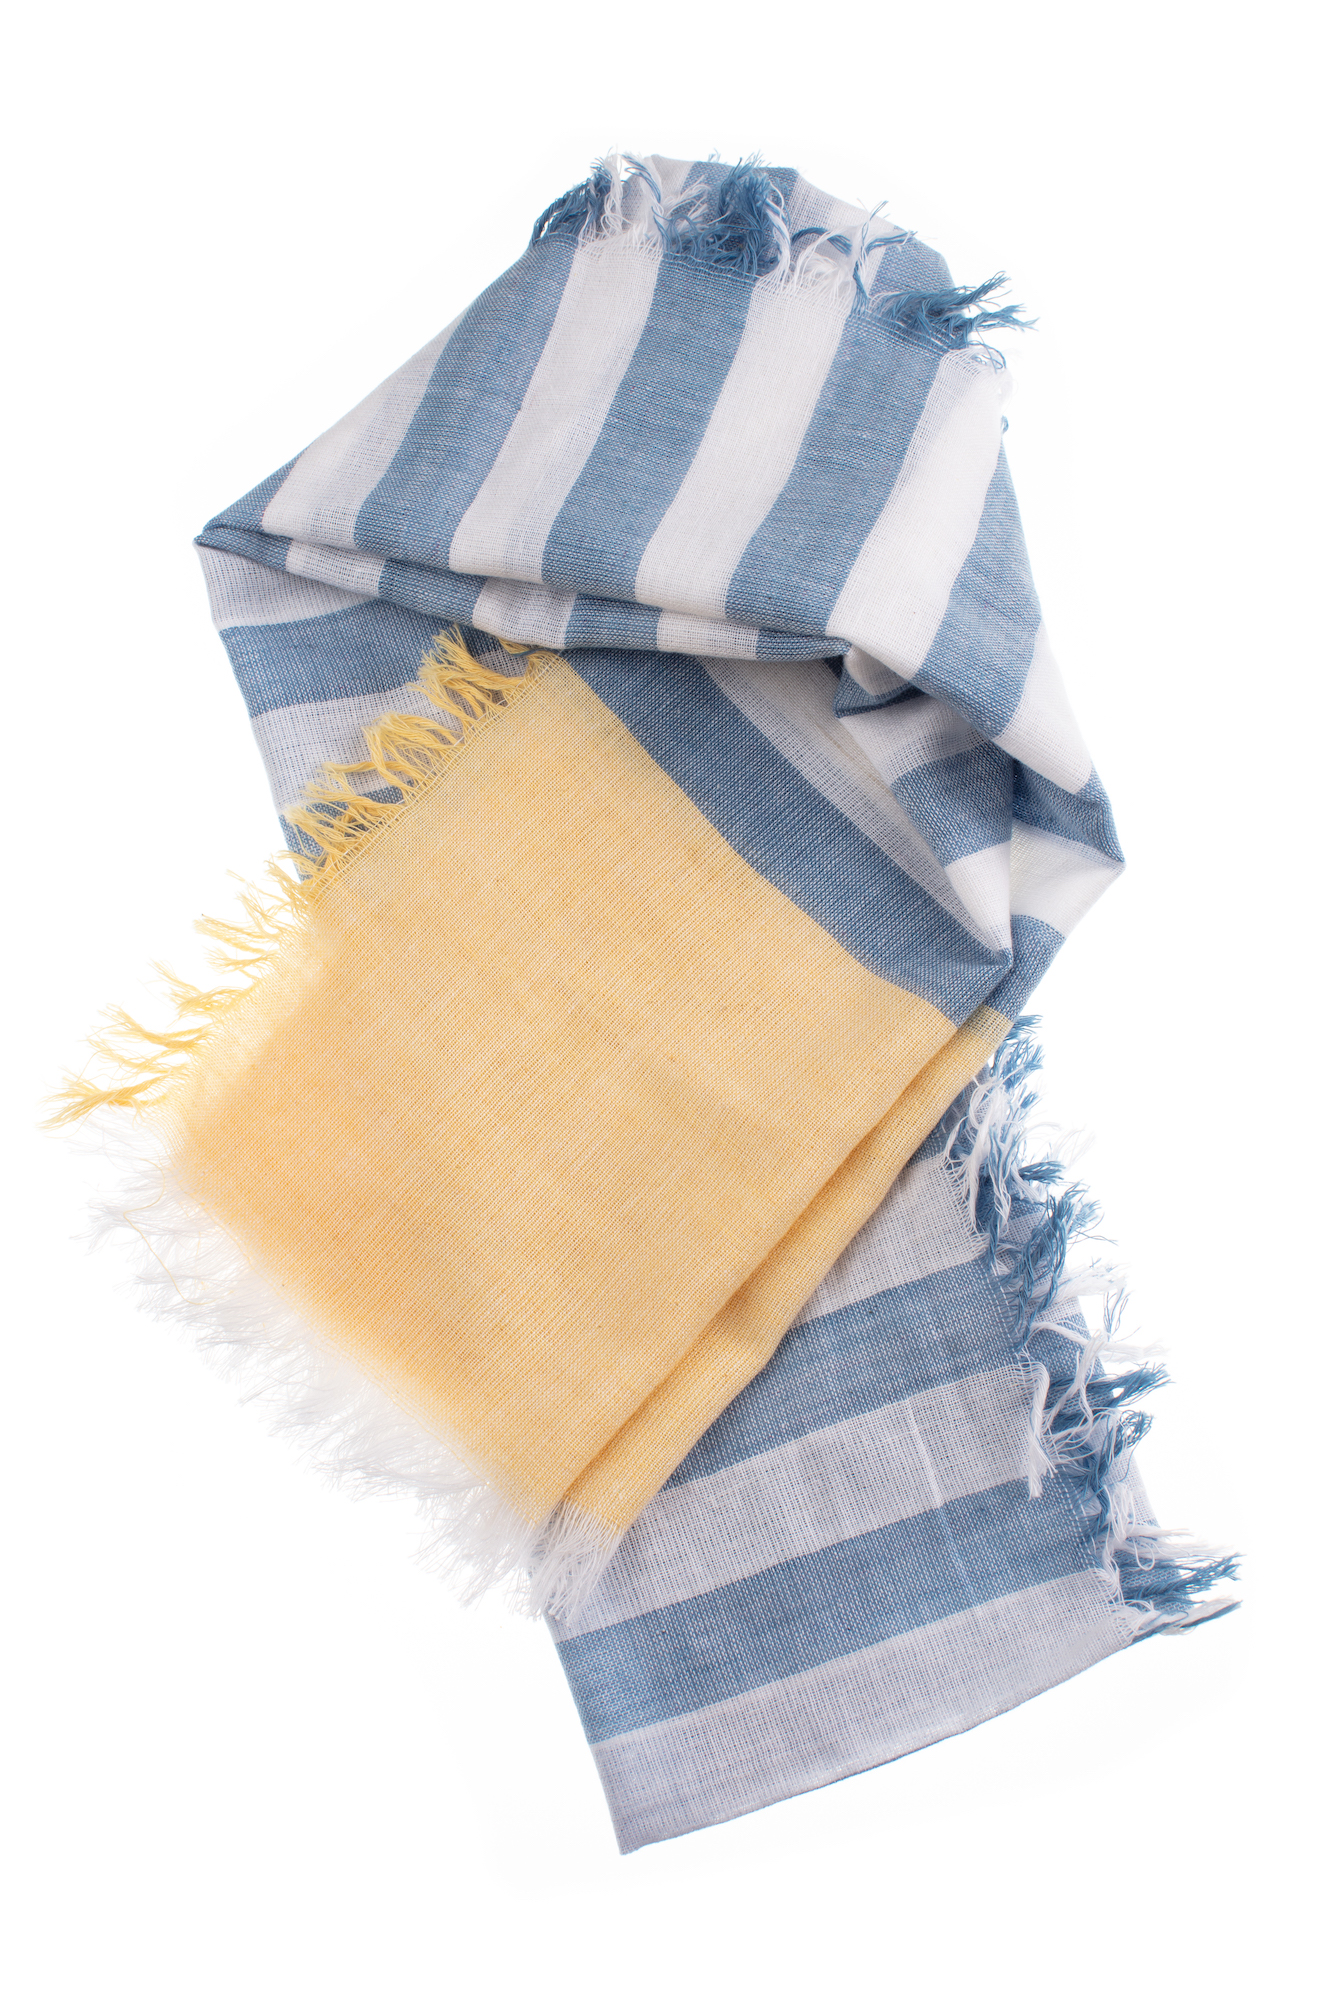 Sky Blue and Lemon Stripes Cotton Scarf